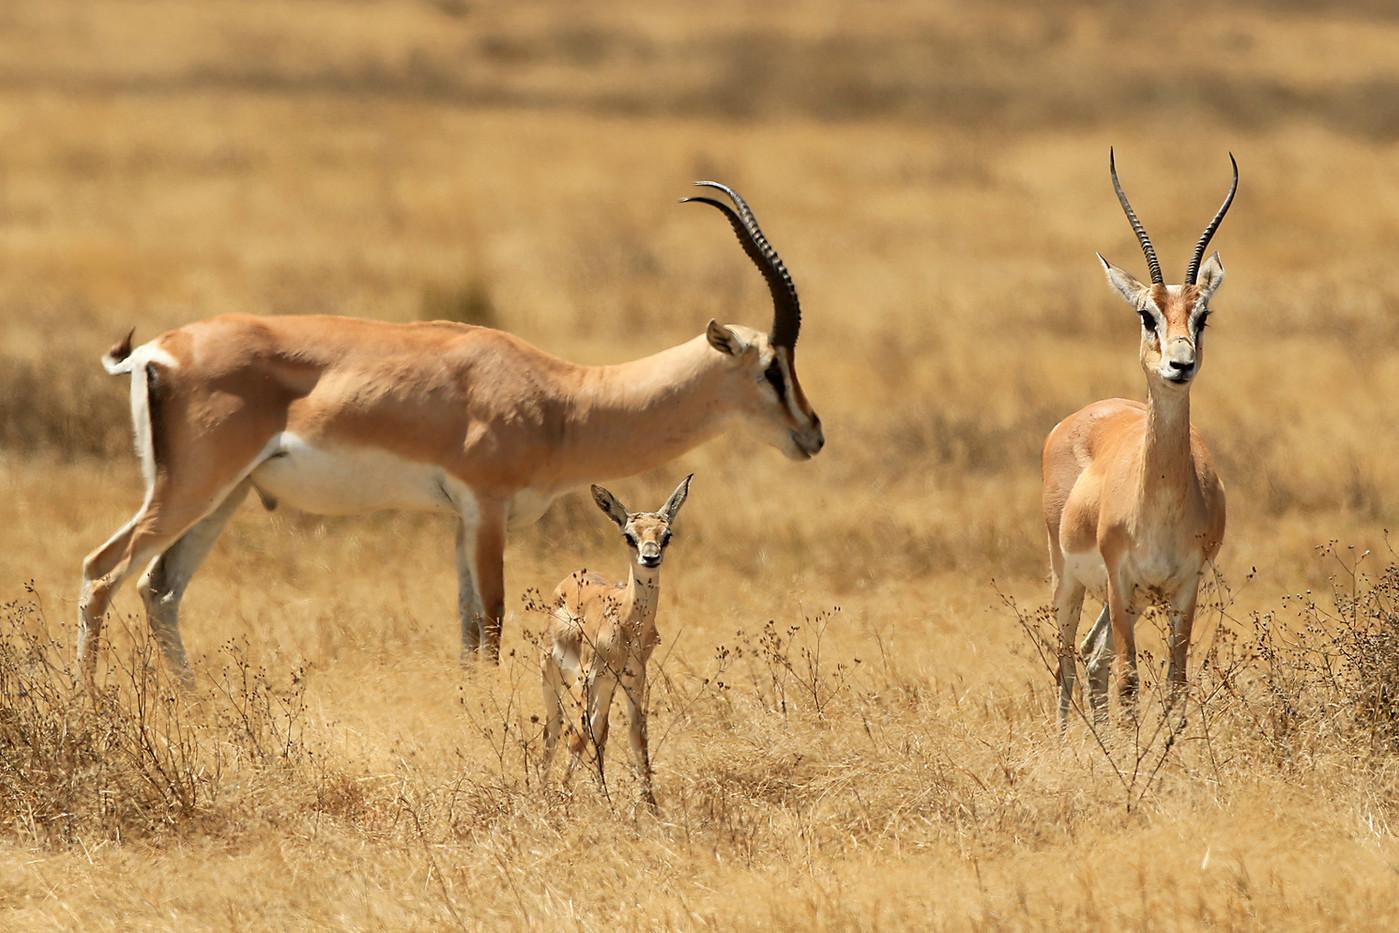 Grant's Gazelle & foal in the Ngorongoro Crater, Tanzania